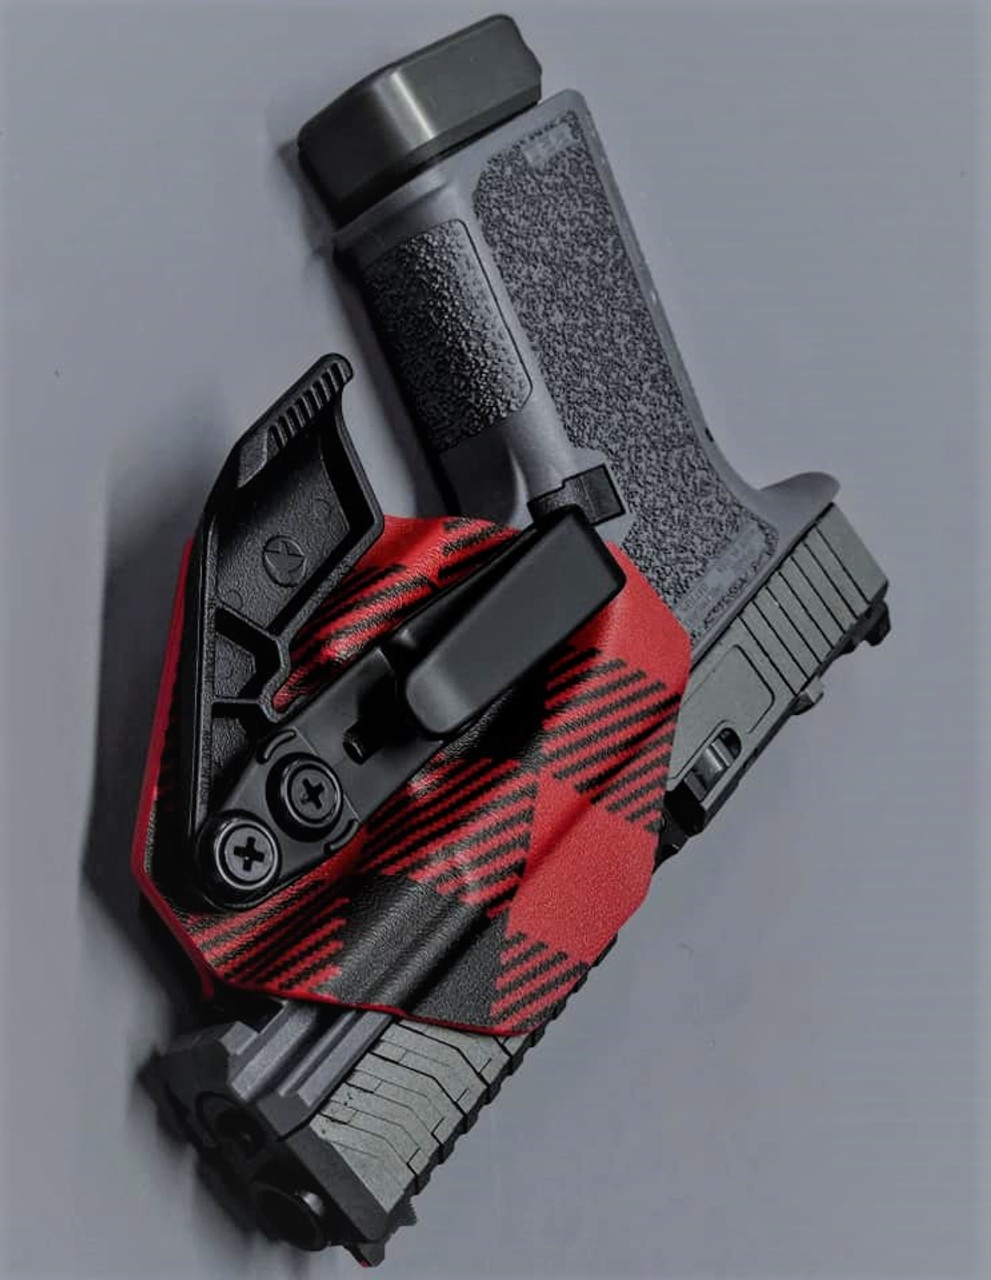 Glock Poly 80 Minimalist Holster